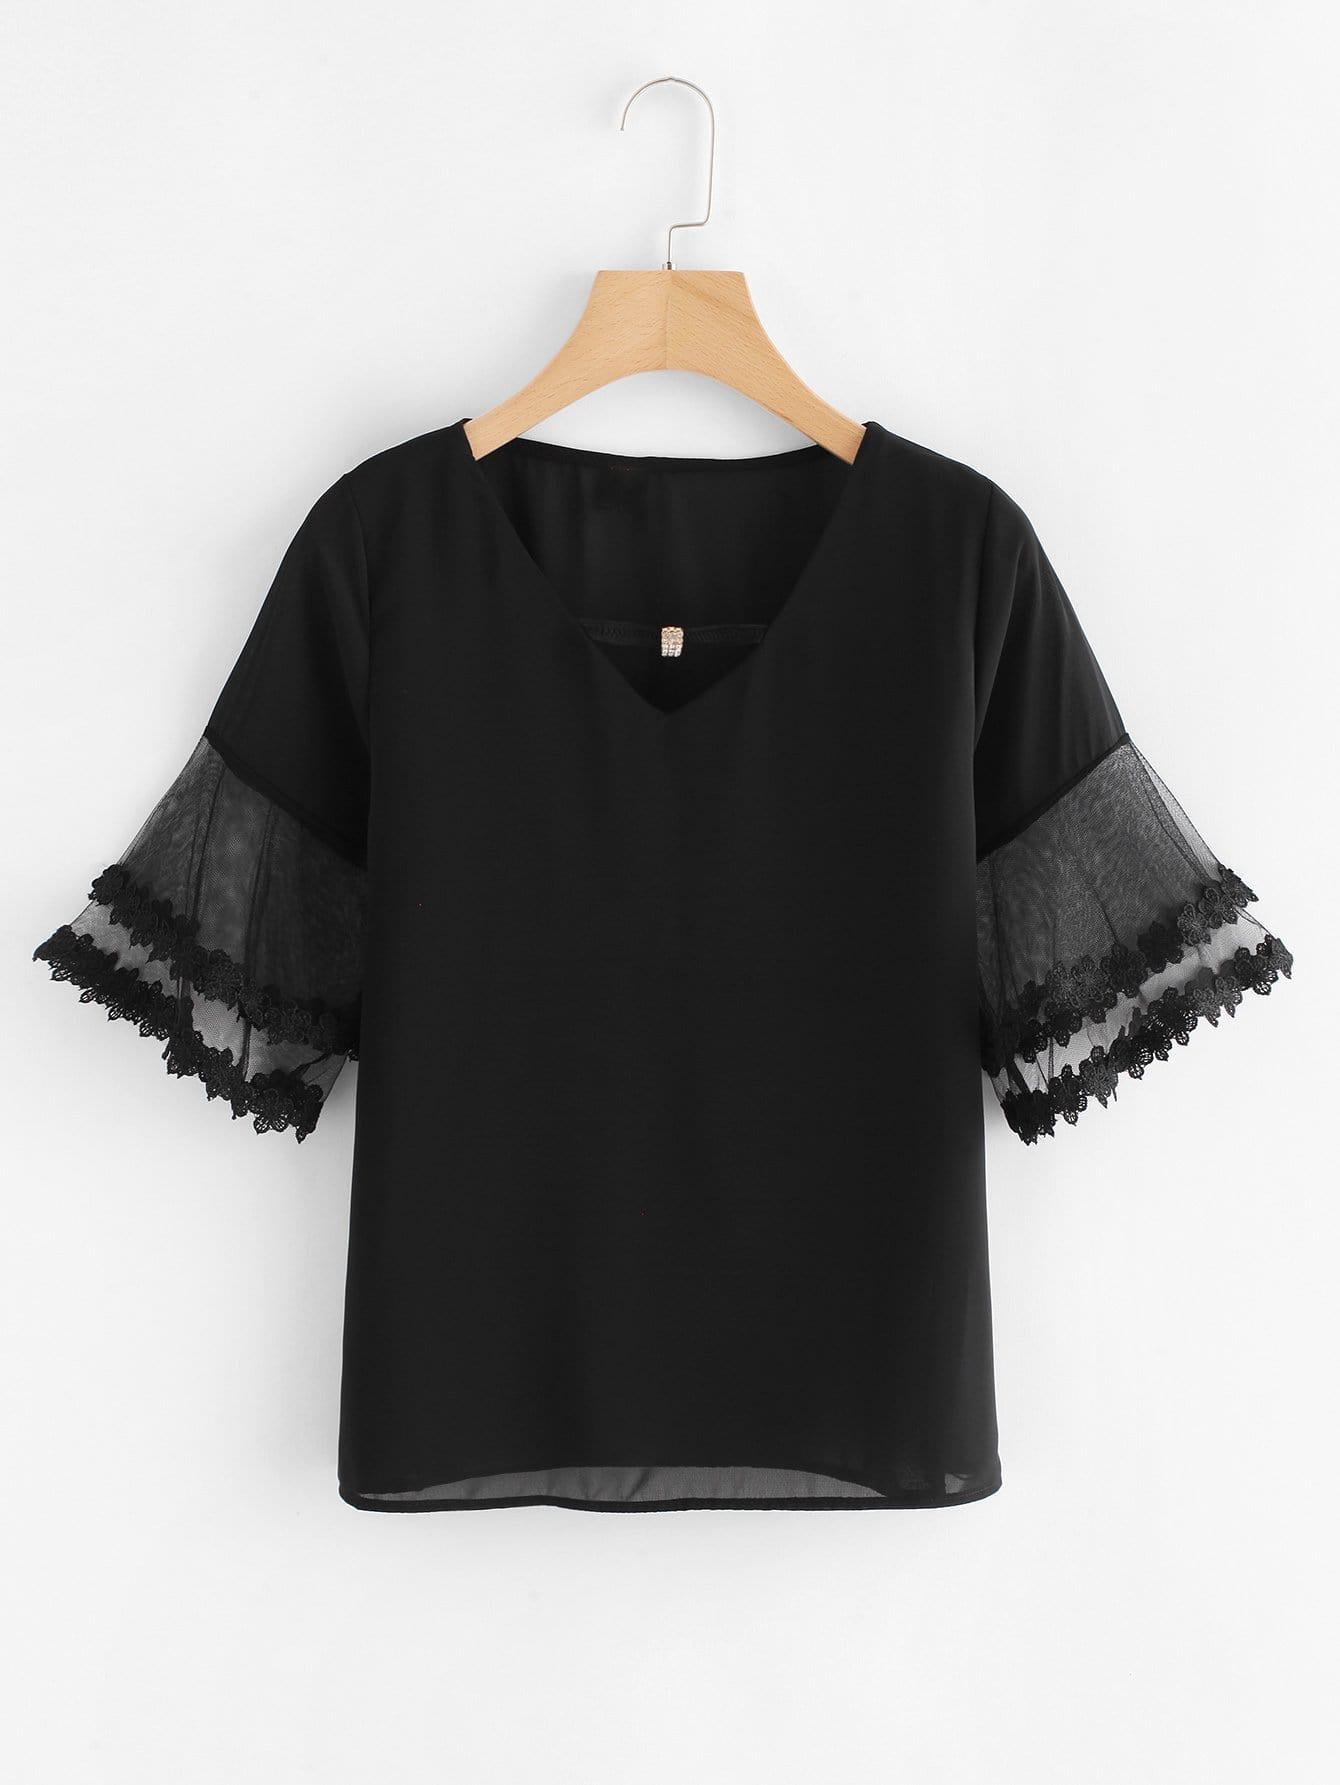 Contrast Mesh Sleeve Lace Trim Top mesh contrast lace top